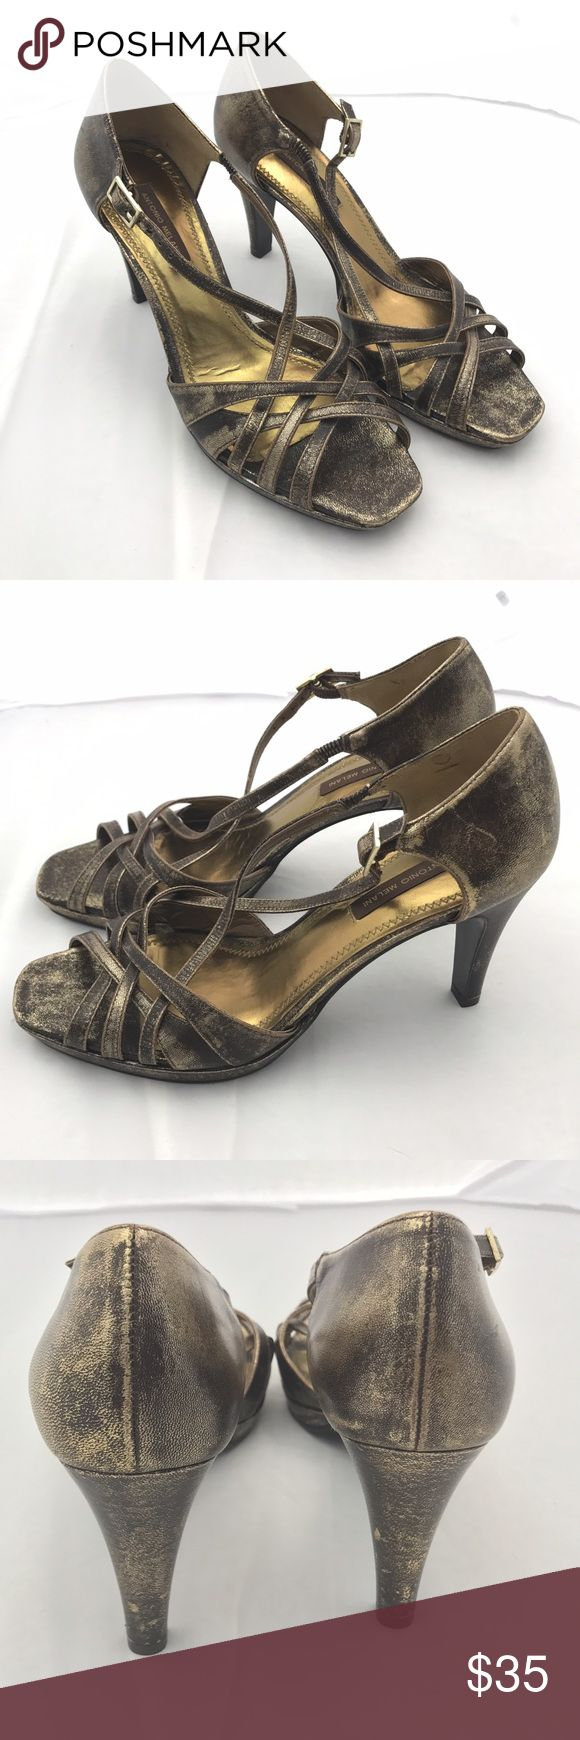 ANTONIO MELANI GOLD BROWN STRAPPY HEELS SIZE Gorgeous Antonio Melani high heels. SIZE 7.5 ANTONIO MELANI Shoes Heels